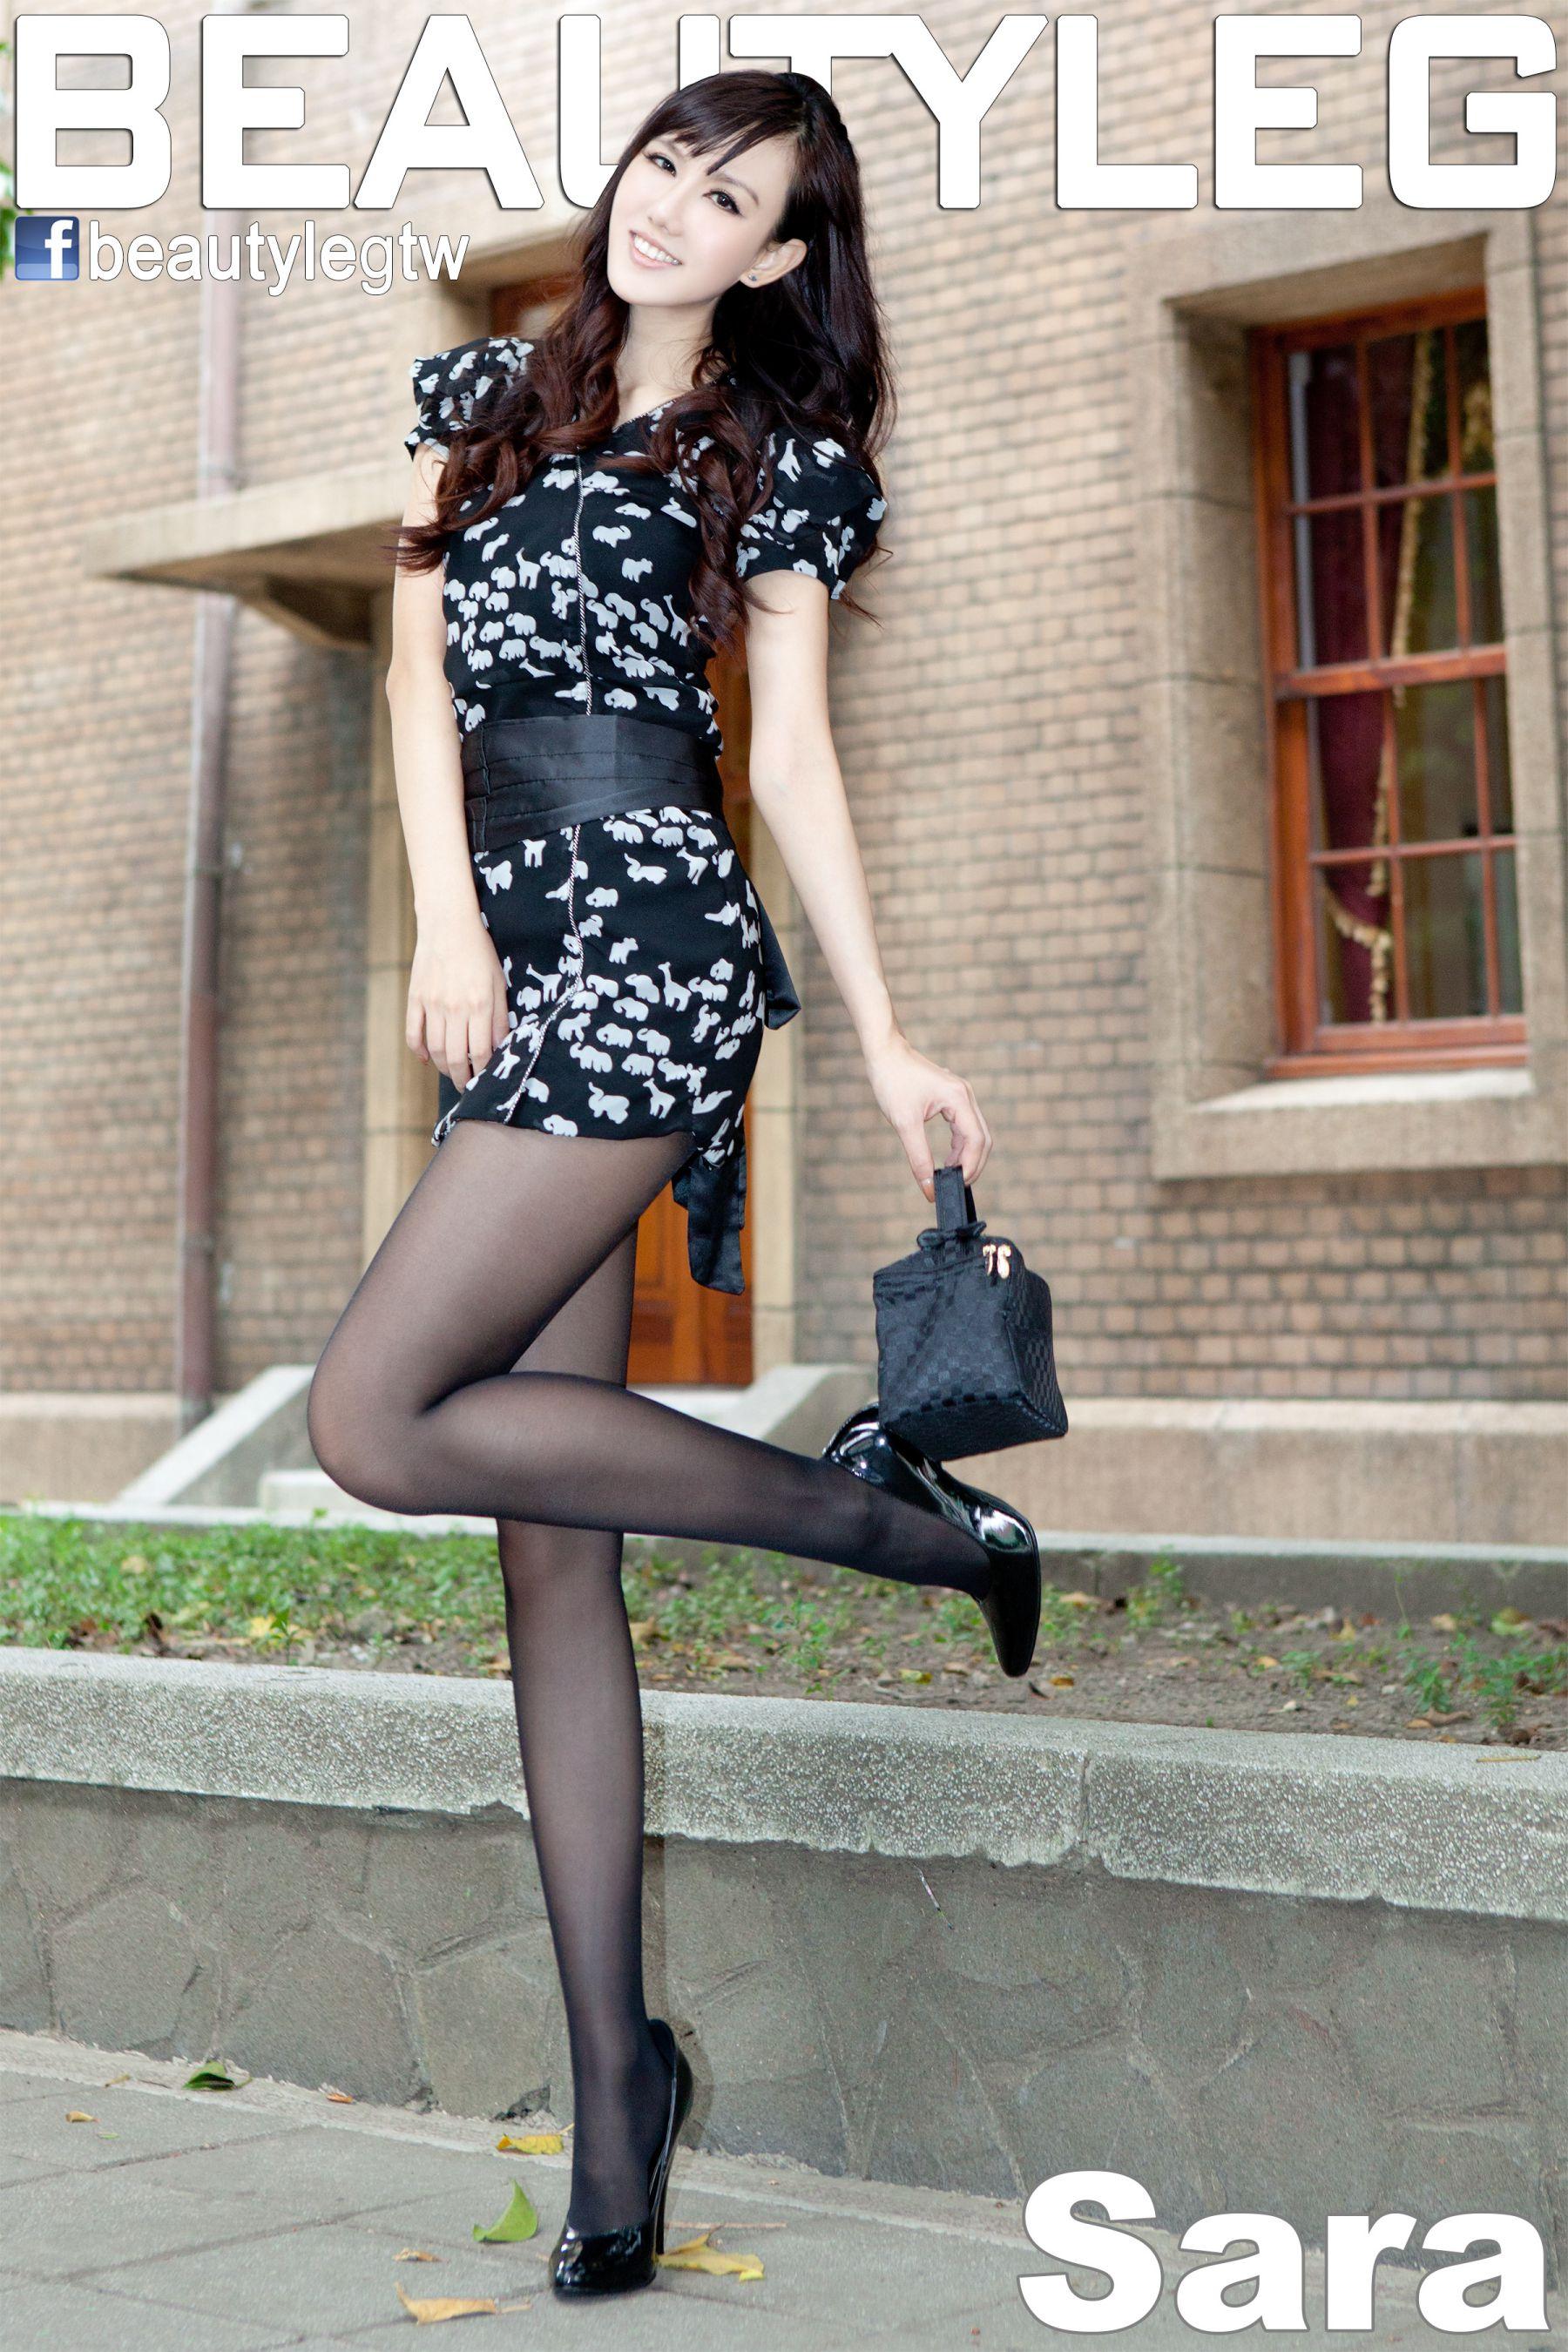 VOL.689 [Beautyleg]丝袜美腿黑丝街拍黑丝街拍美腿:林瑞瑜(Beautyleg Sara,腿模Sara)高品质写真套图(49P)